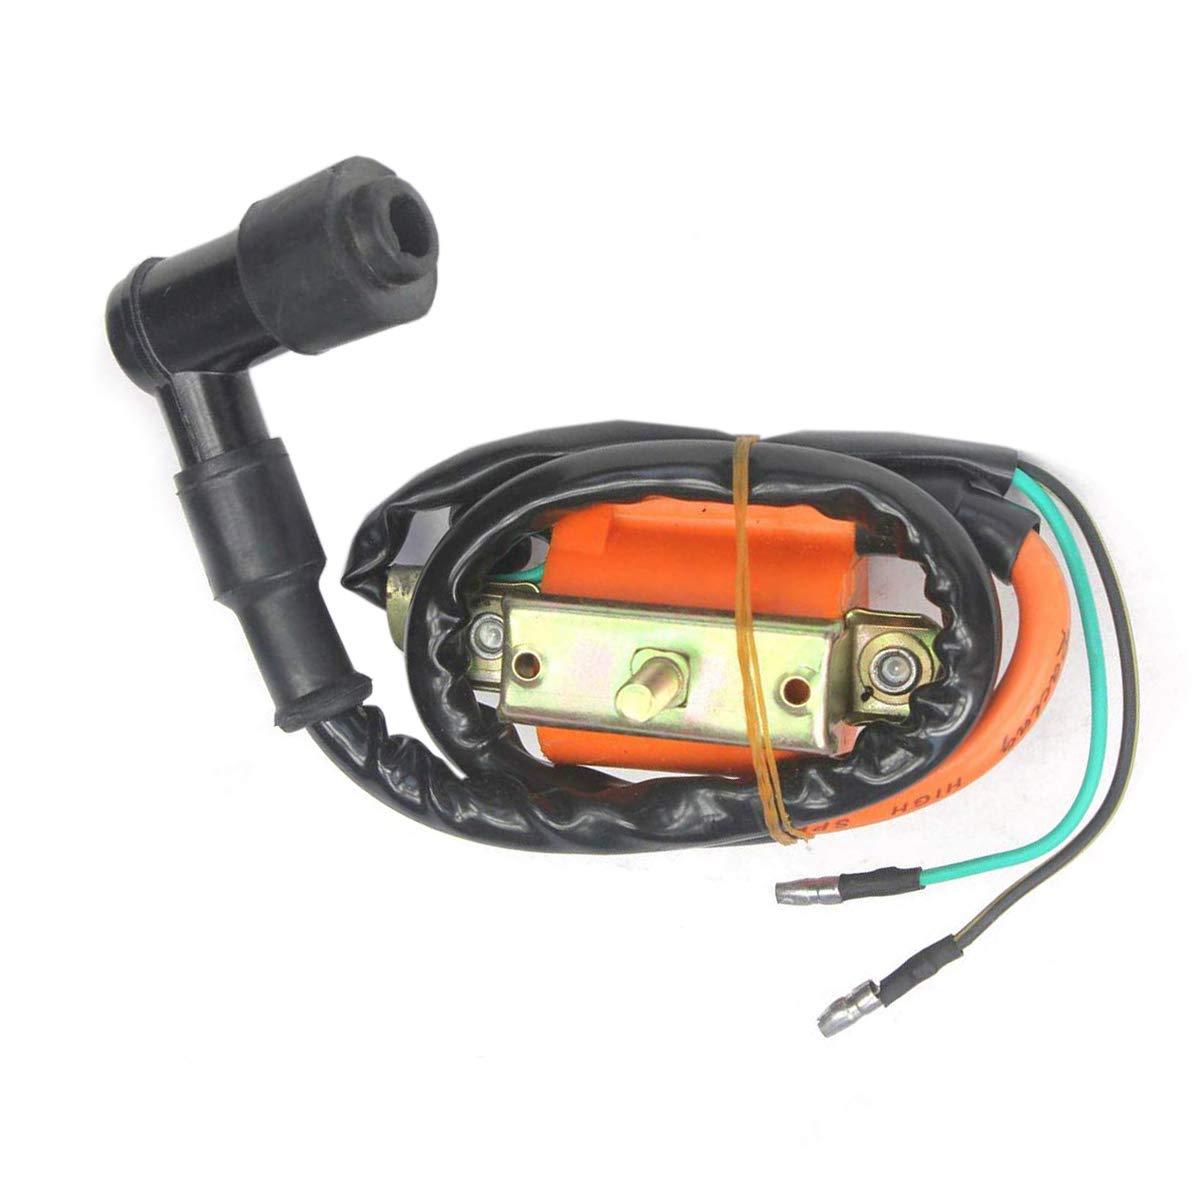 Triumilynn Ignition Coil for 50cc 90cc 110cc 125cc ATV Dirt Bike Quad Go Kart Buggy Orange